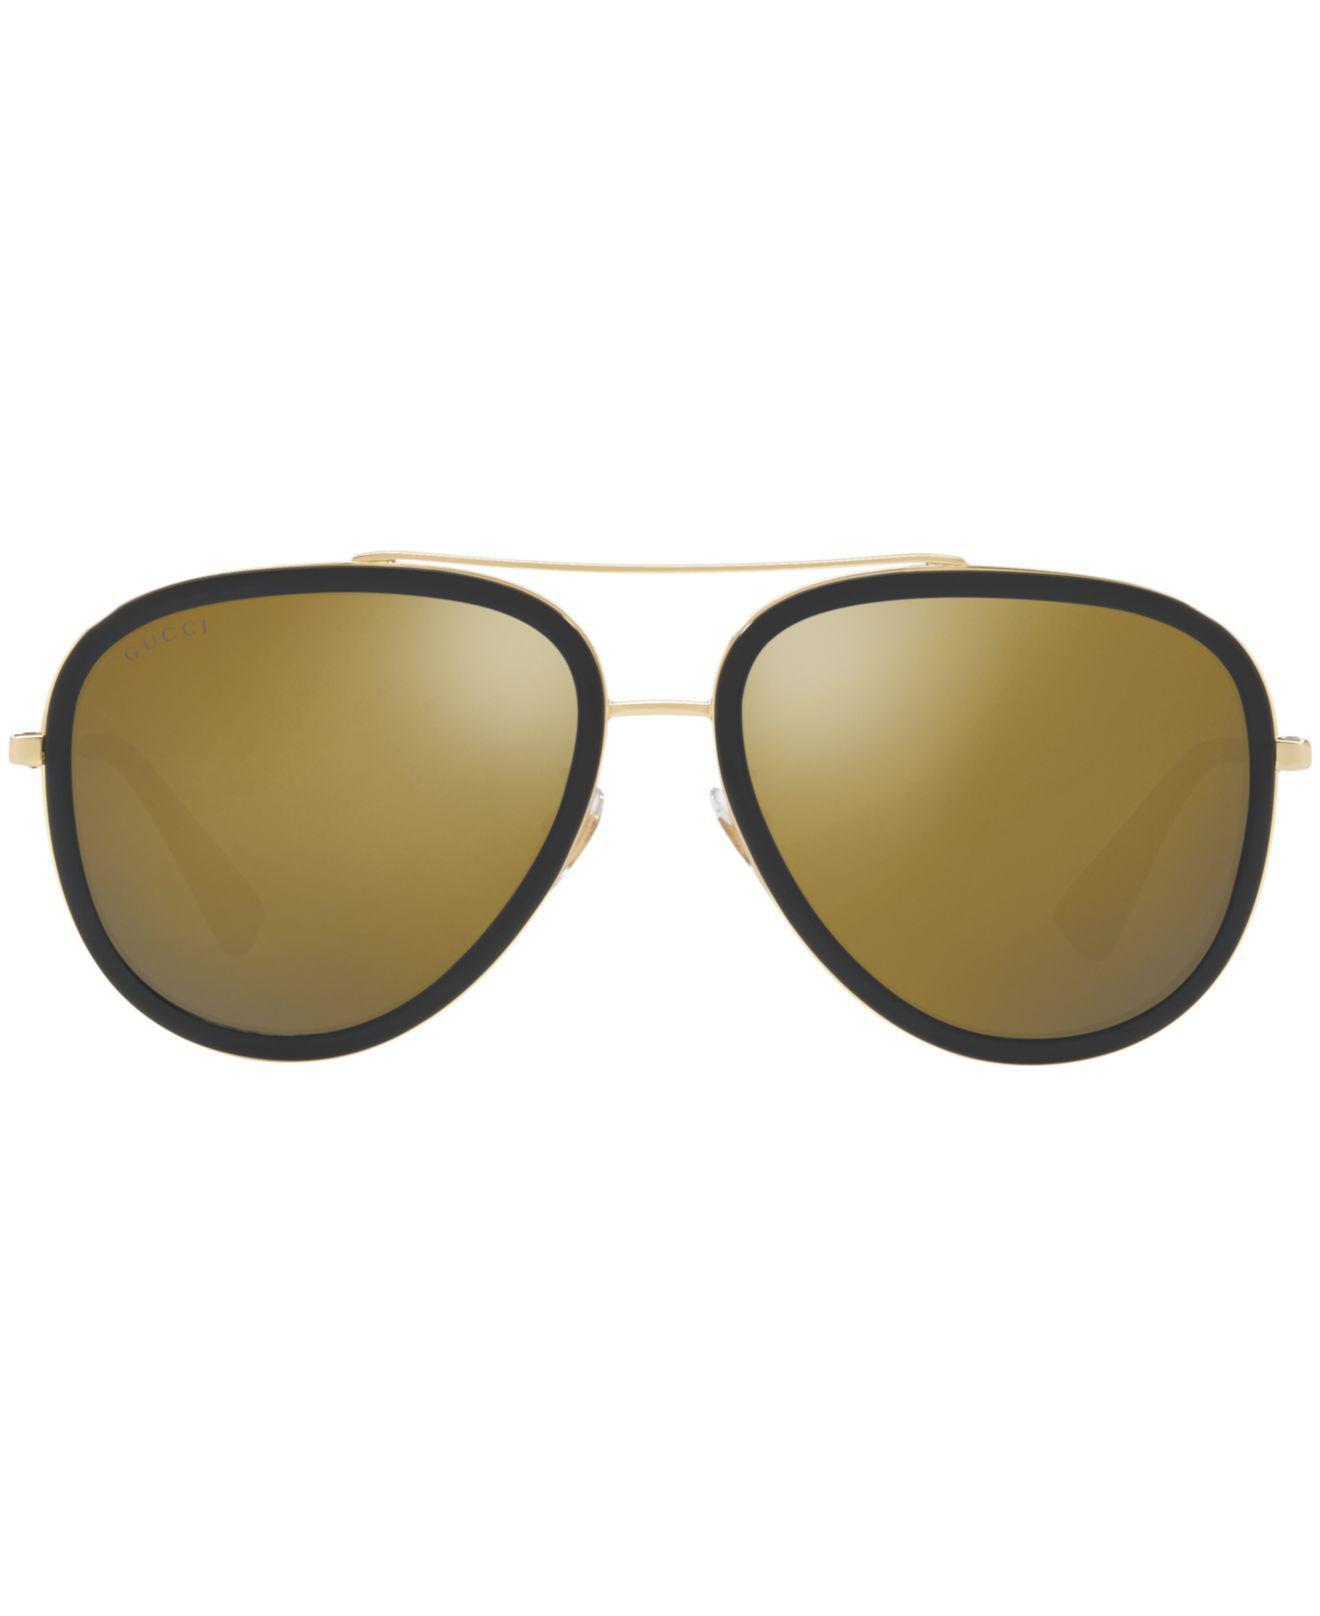 5a645f0c2b5 Lyst - Gucci Sunglasses